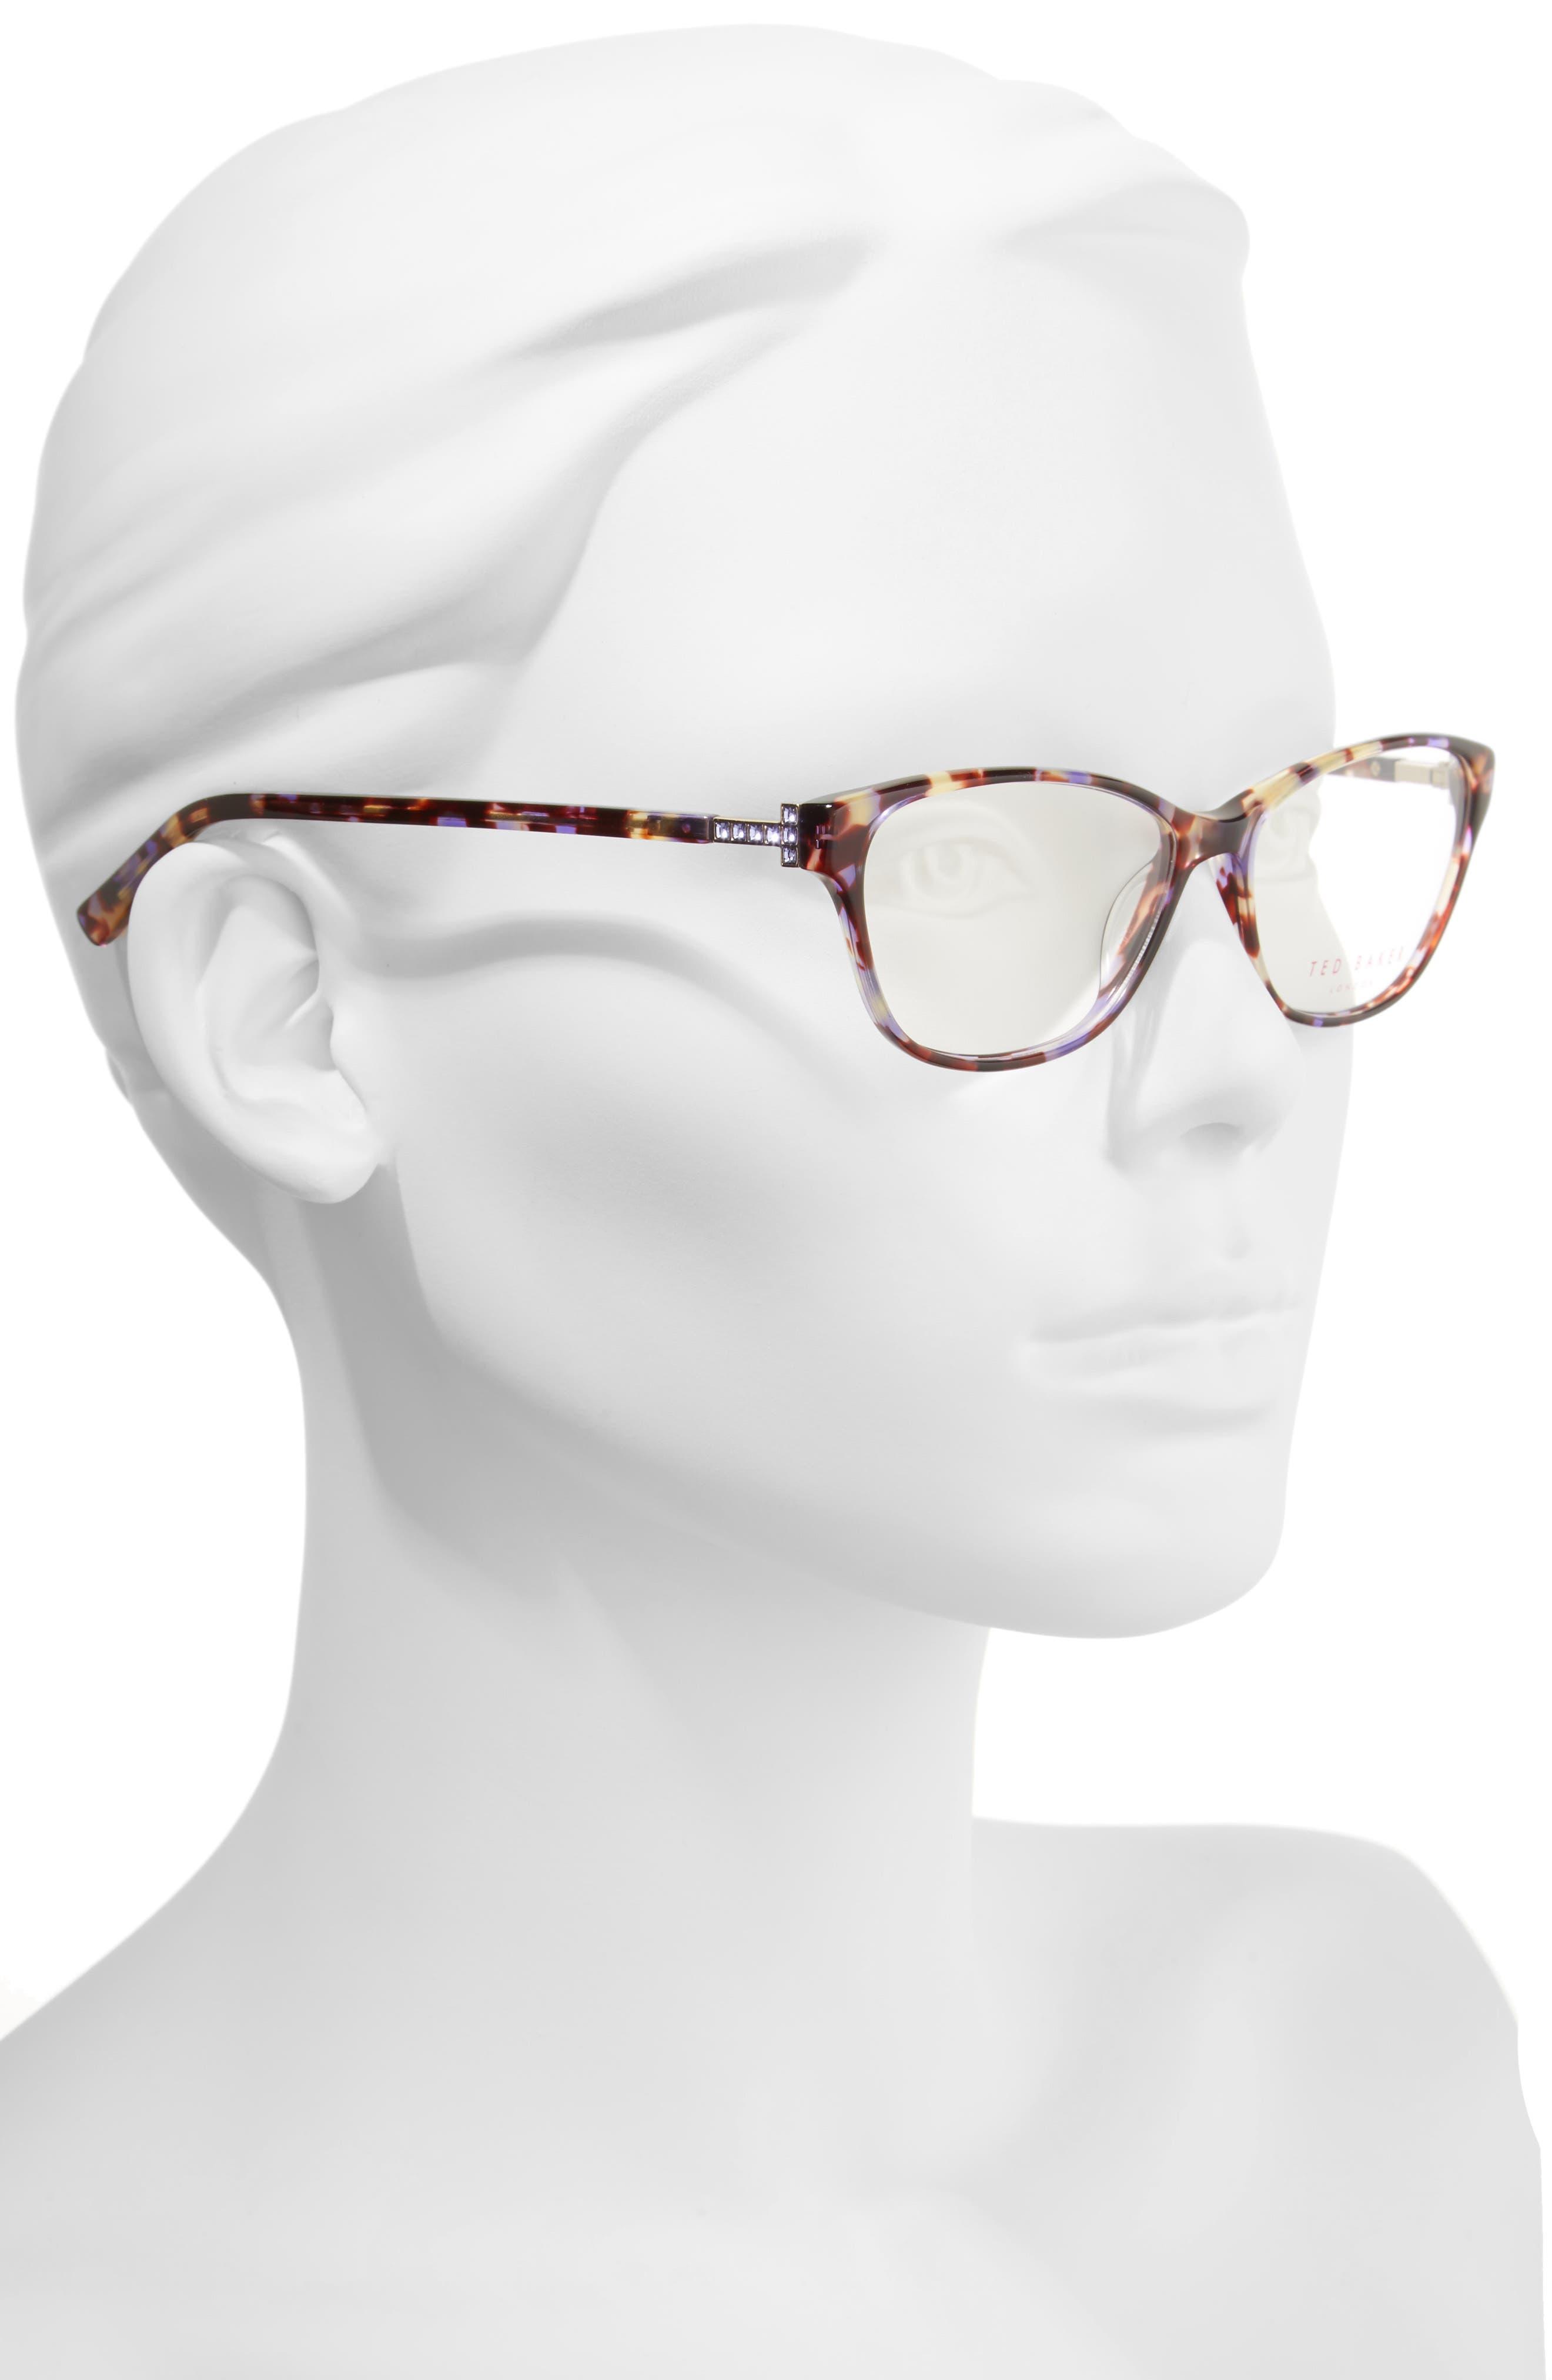 53mm Optical Cat Eye Glasses,                             Alternate thumbnail 2, color,                             Purple